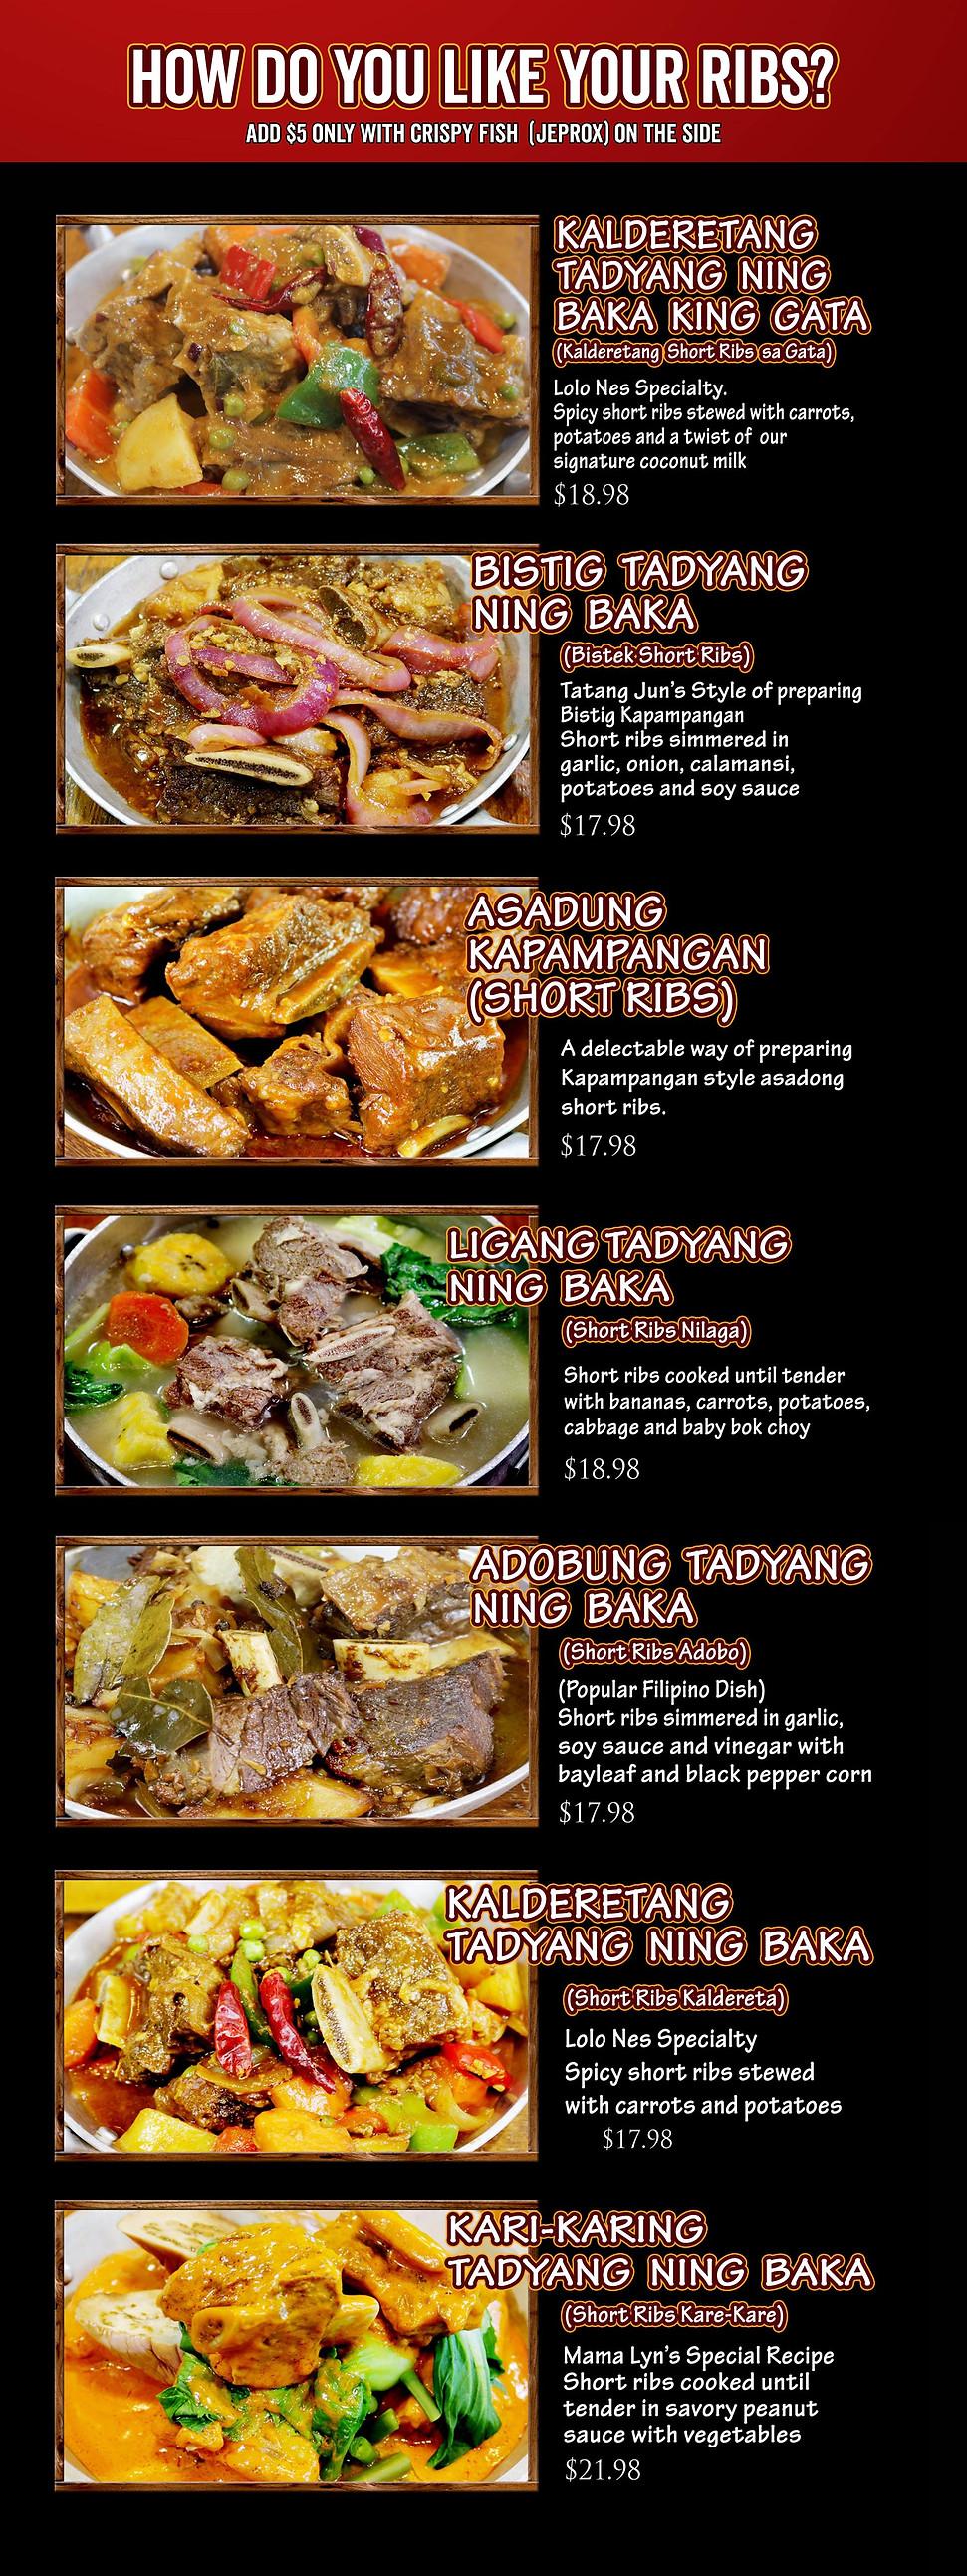 How do you like your ribs.jpg